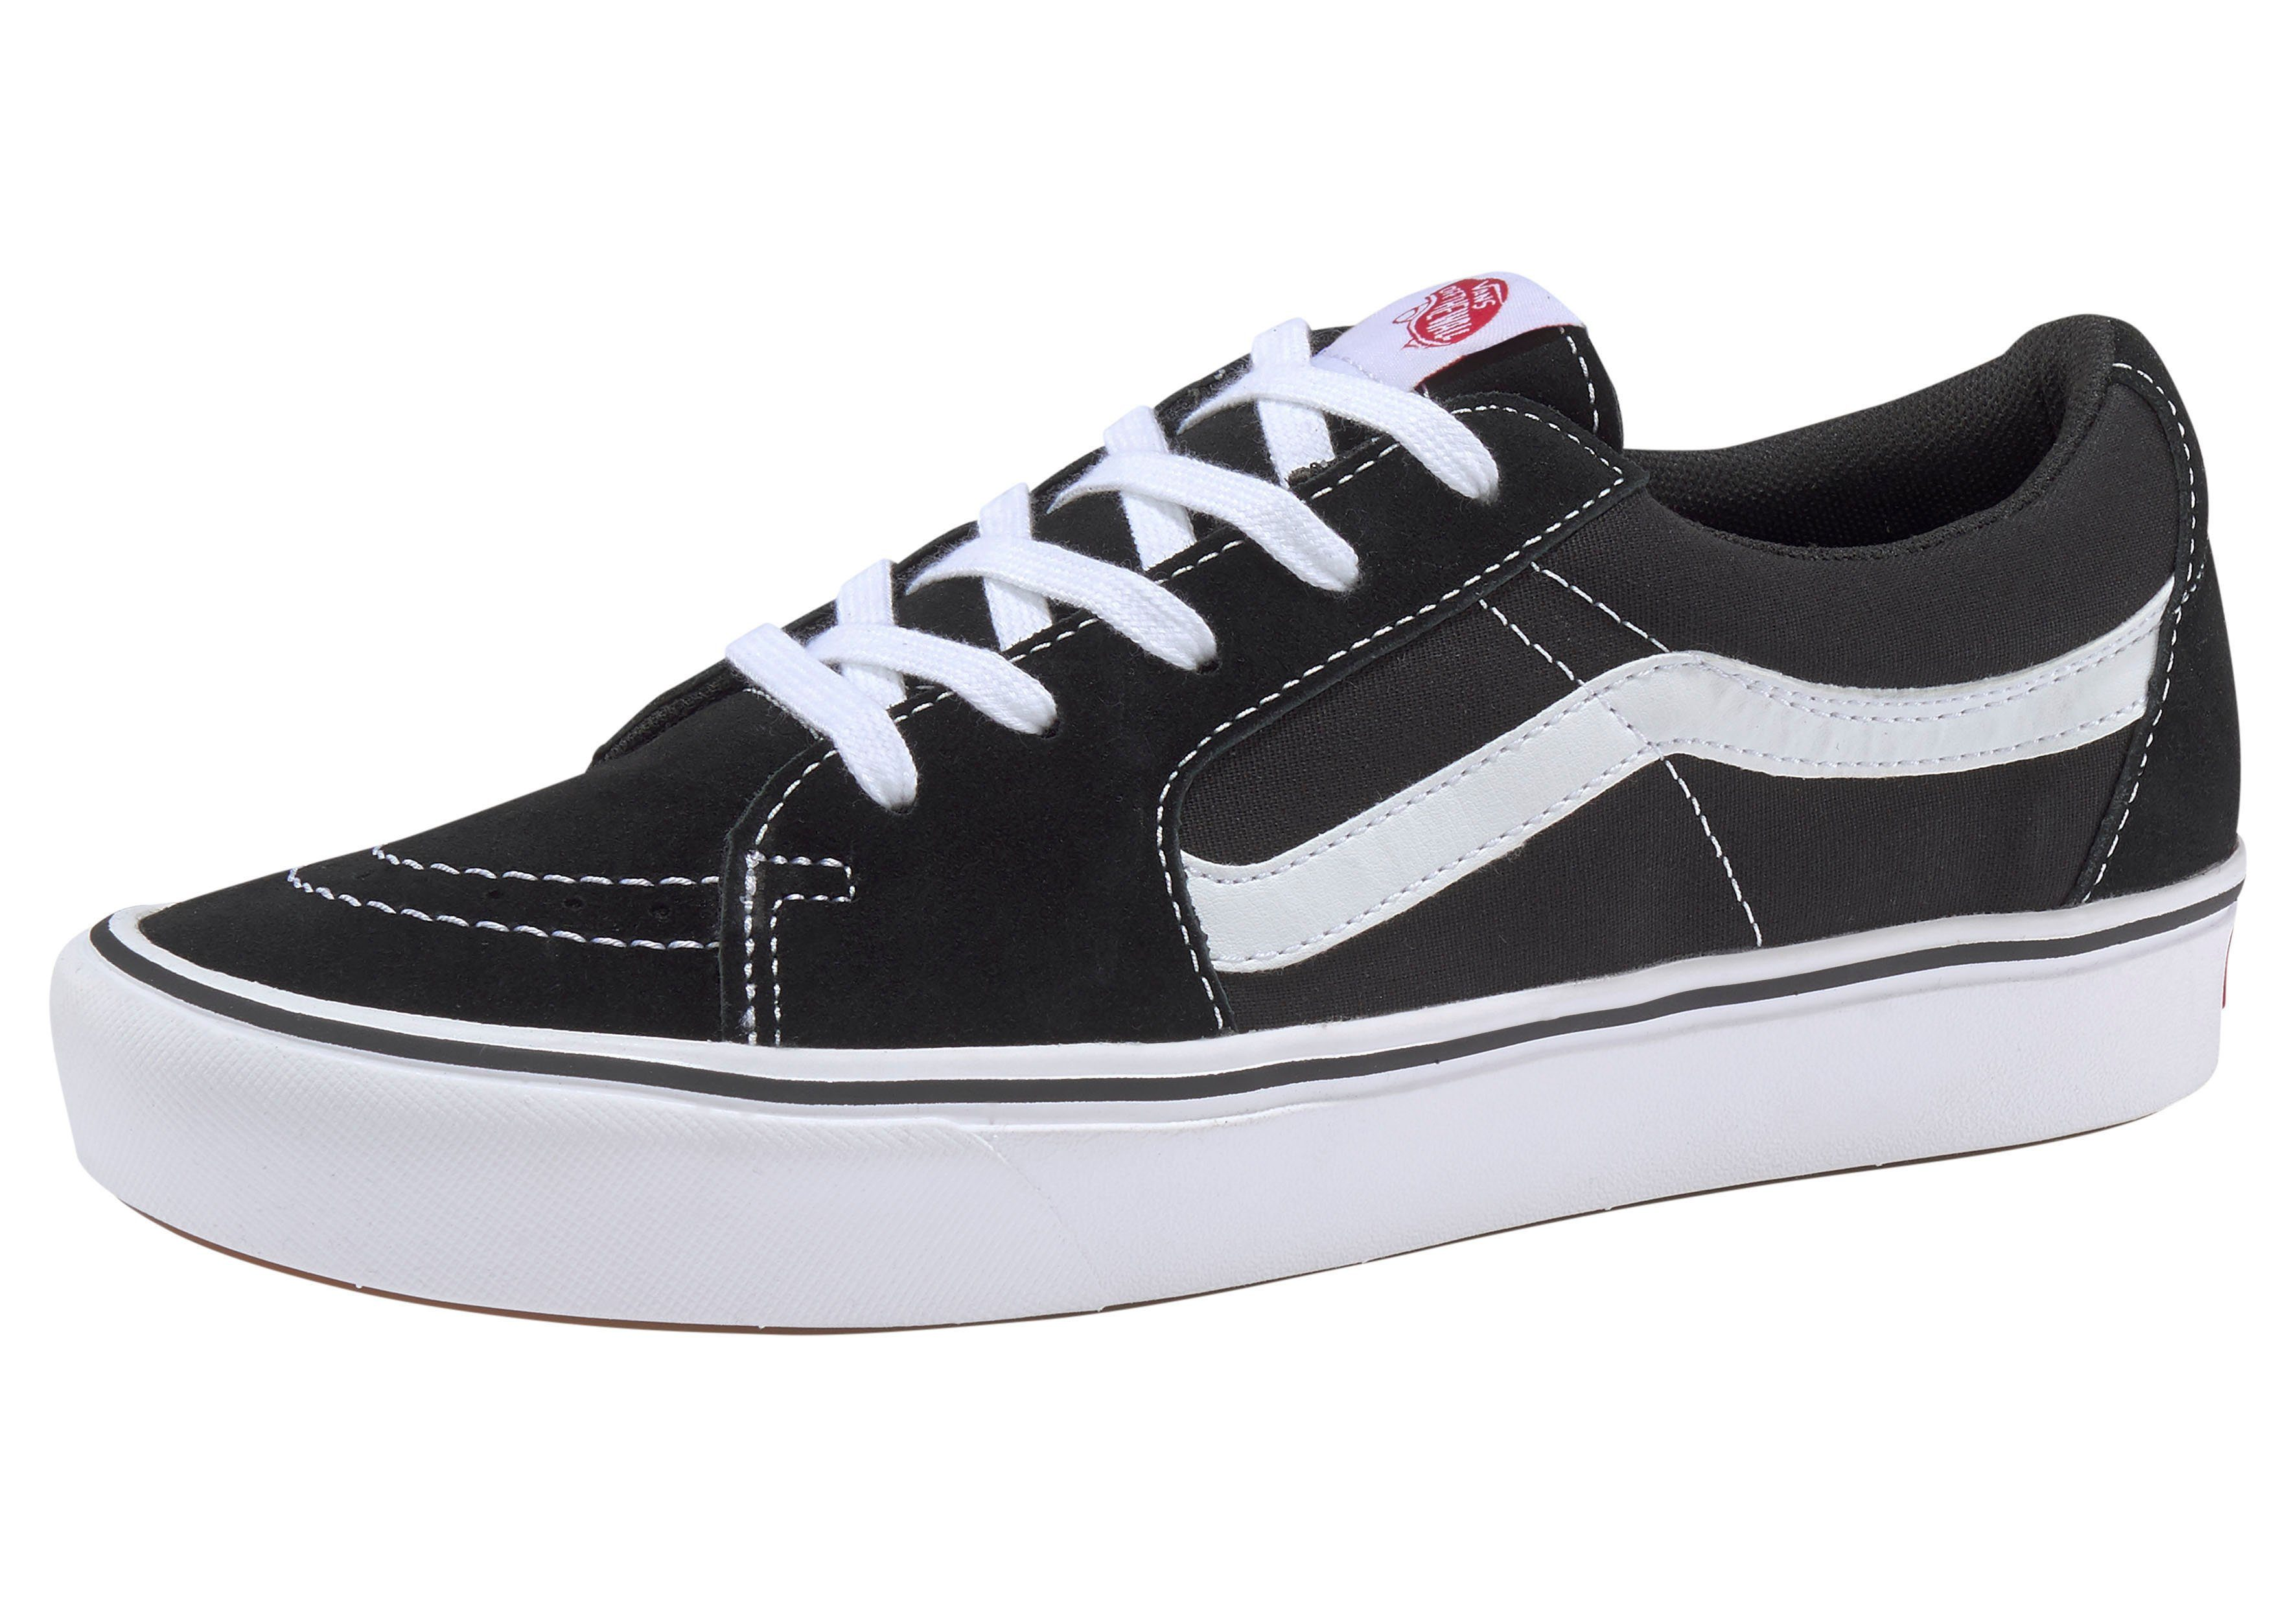 Vans »ComfyCush SK8 Low« Sneaker, Stylishe Sneaker von Vans online kaufen | OTTO